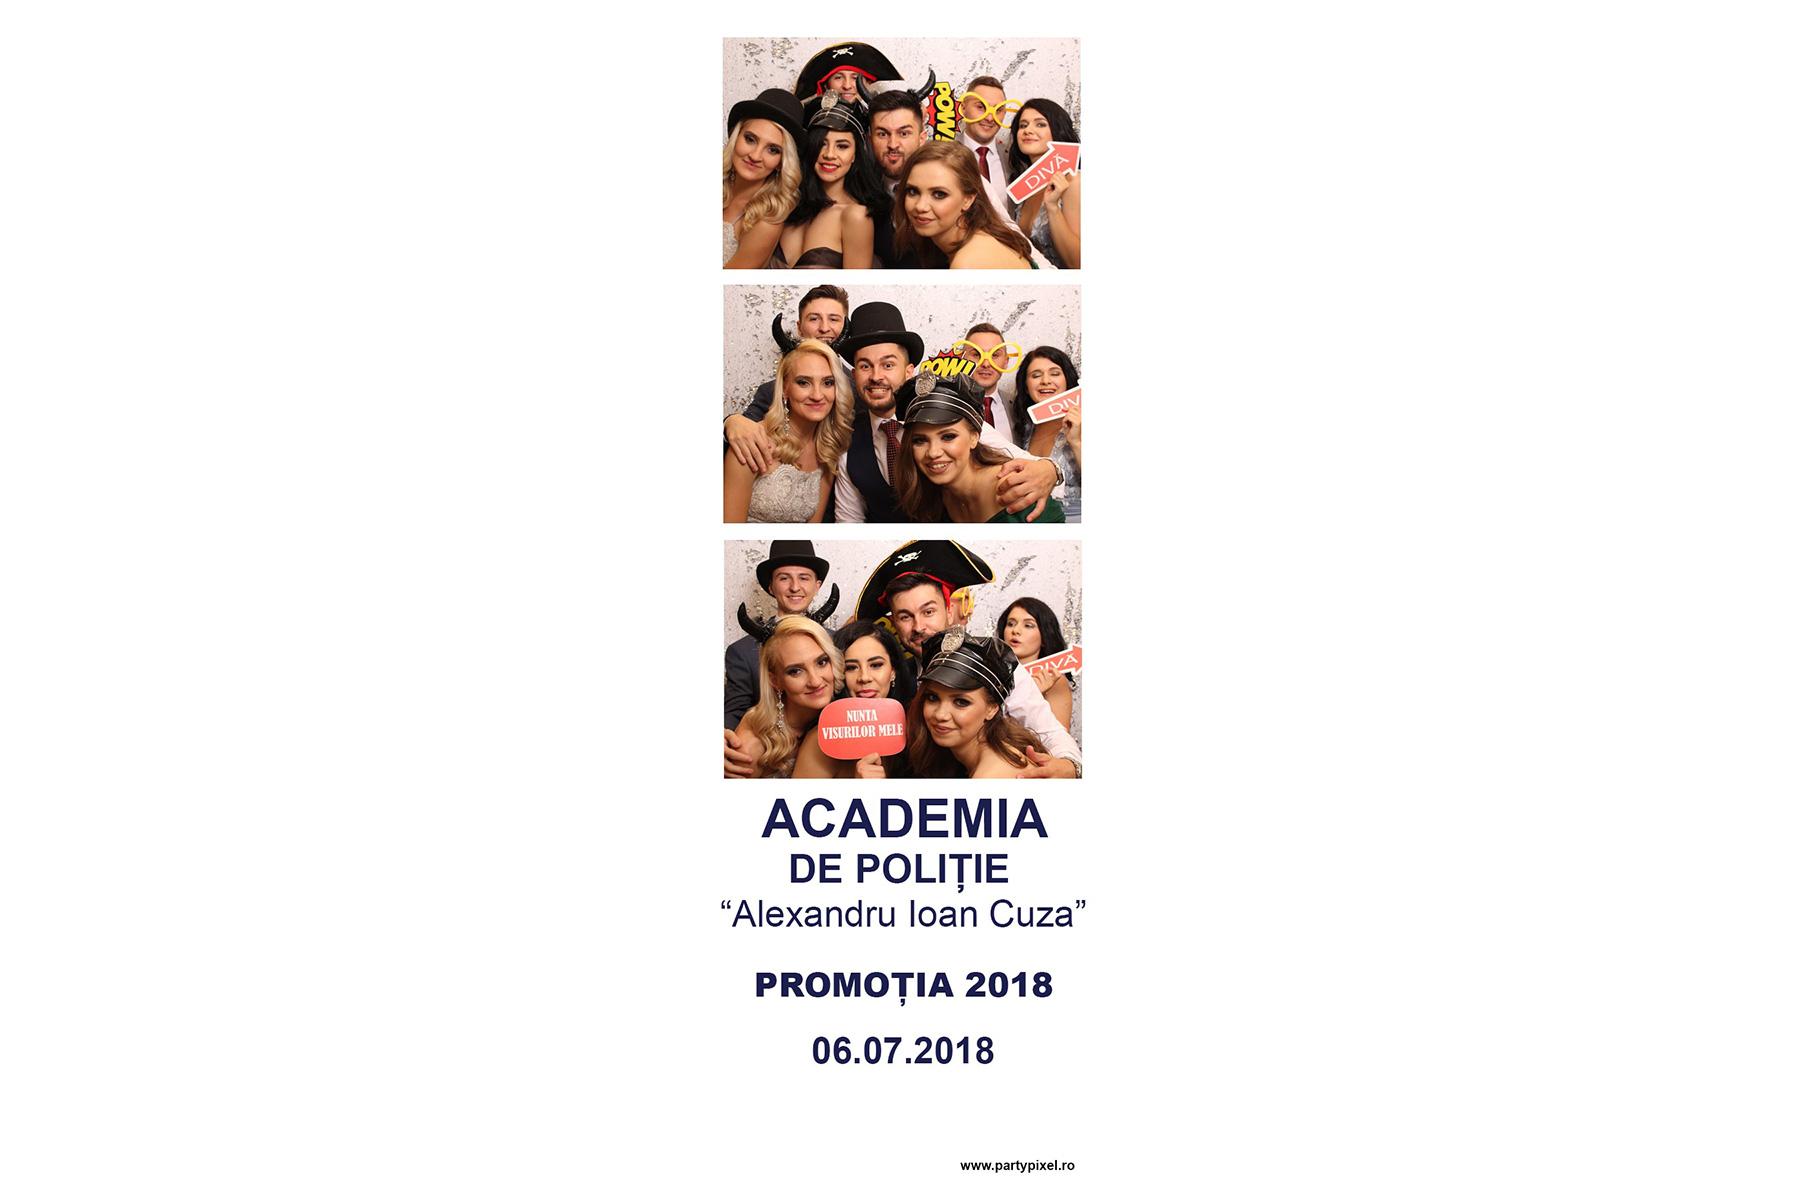 Cabina foto Promitie Academia de Politie